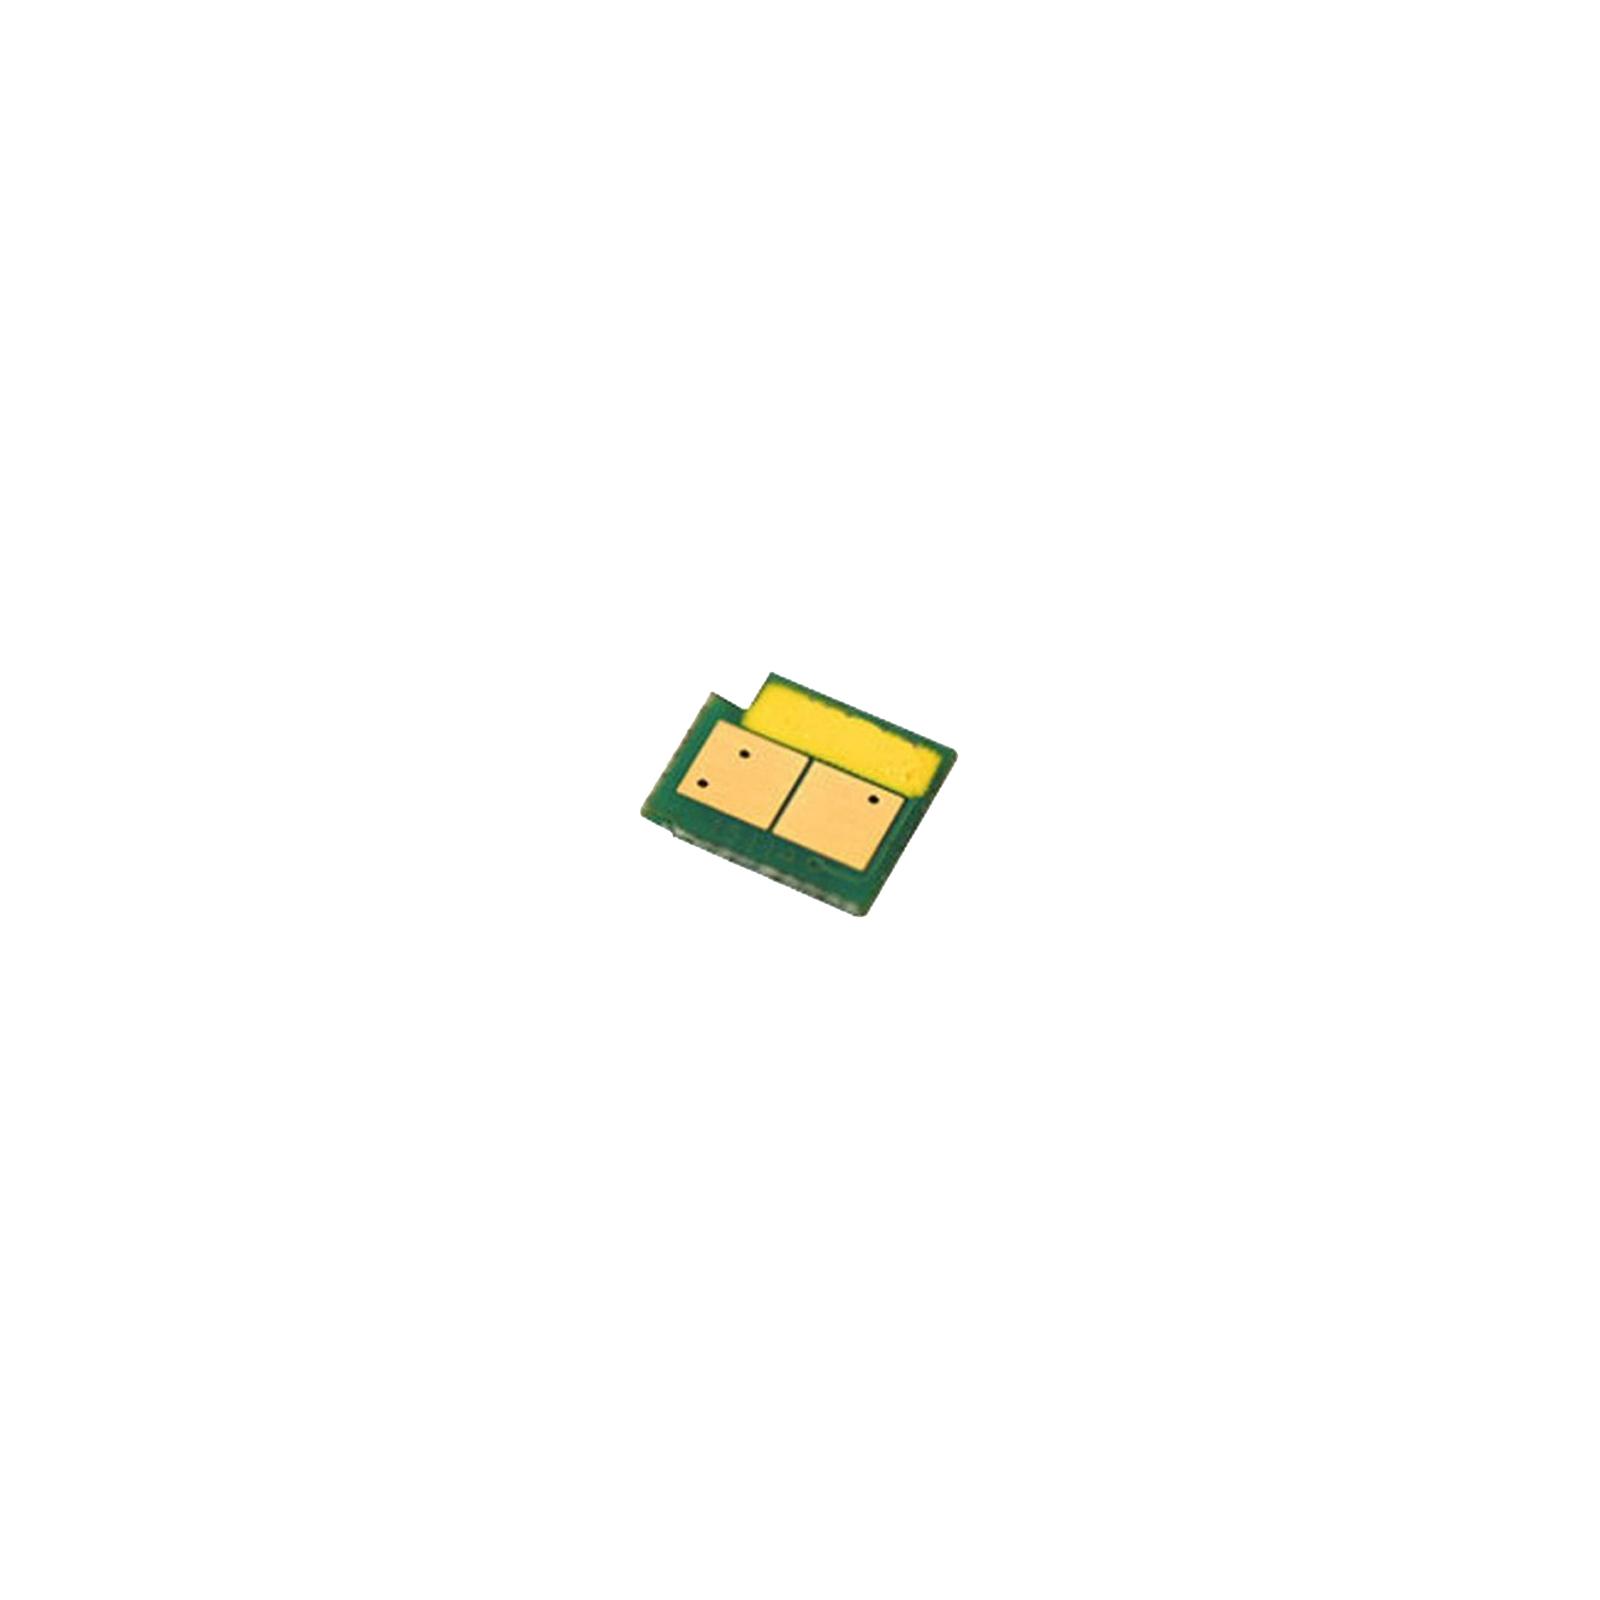 Чип для картриджа HP CLJ 1600/2600 Yellow Static Control (U15-2CHIP-Y)